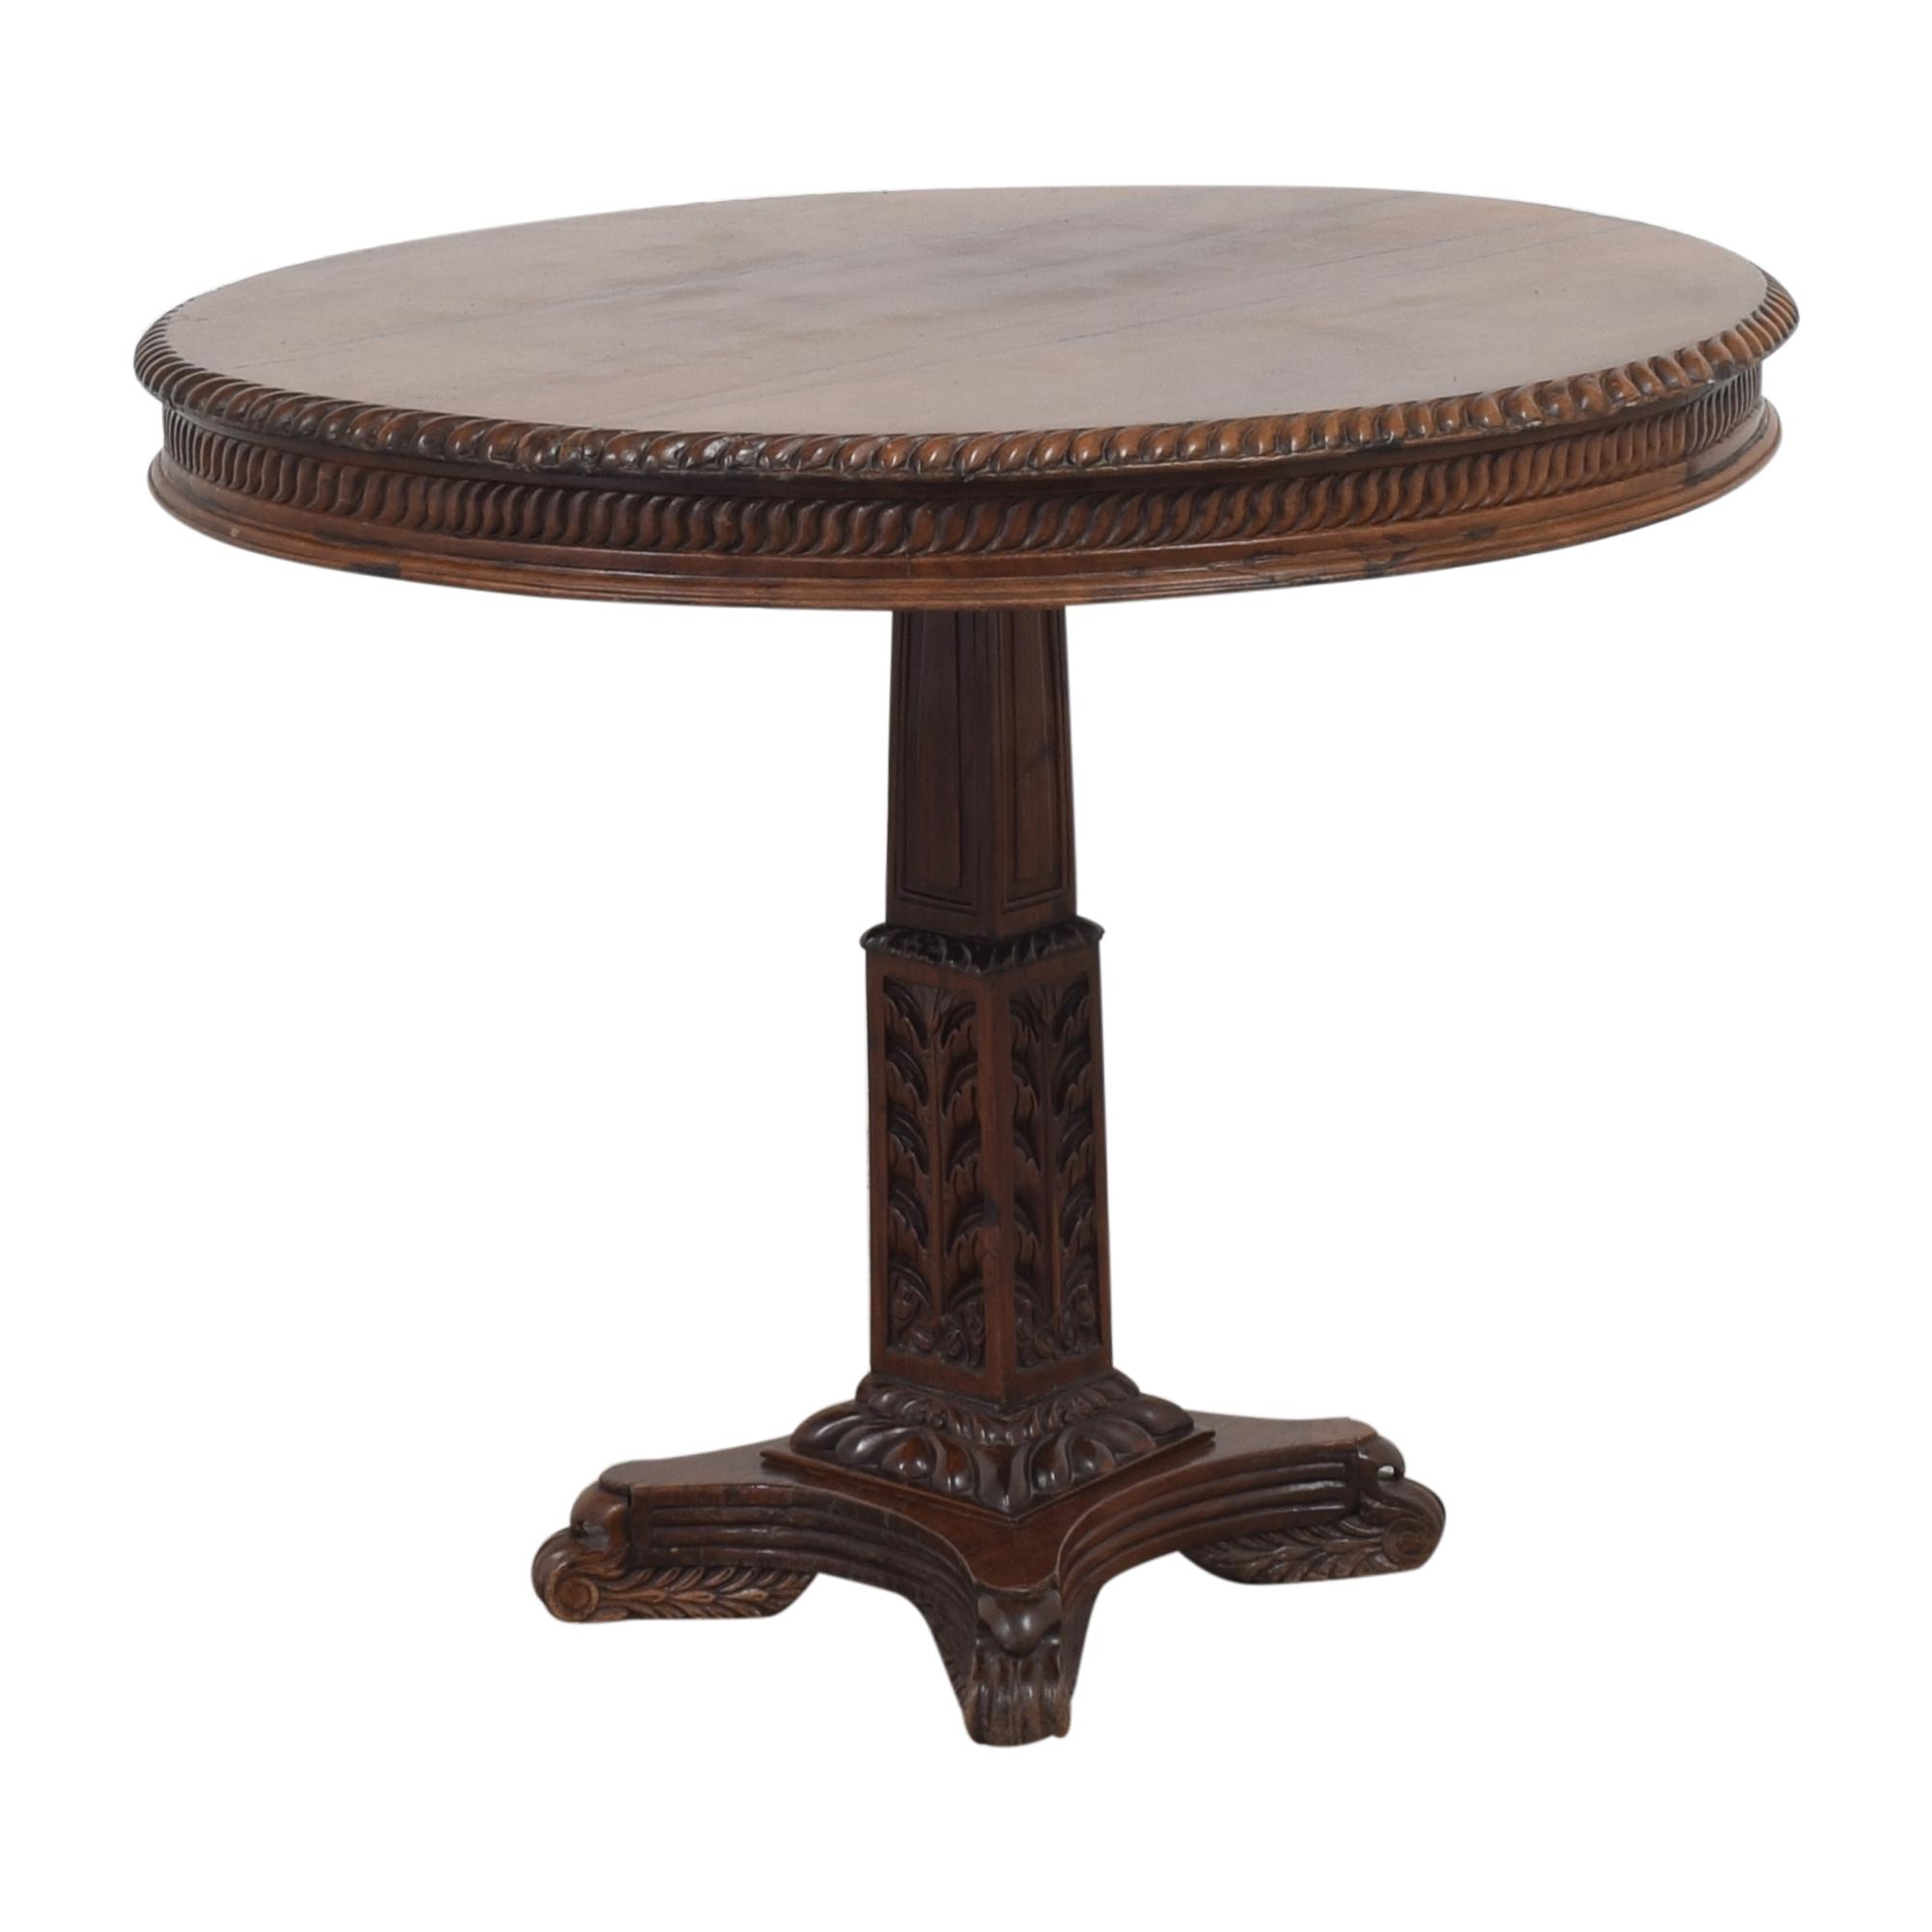 Vintage-Style Pedestal Game Table used